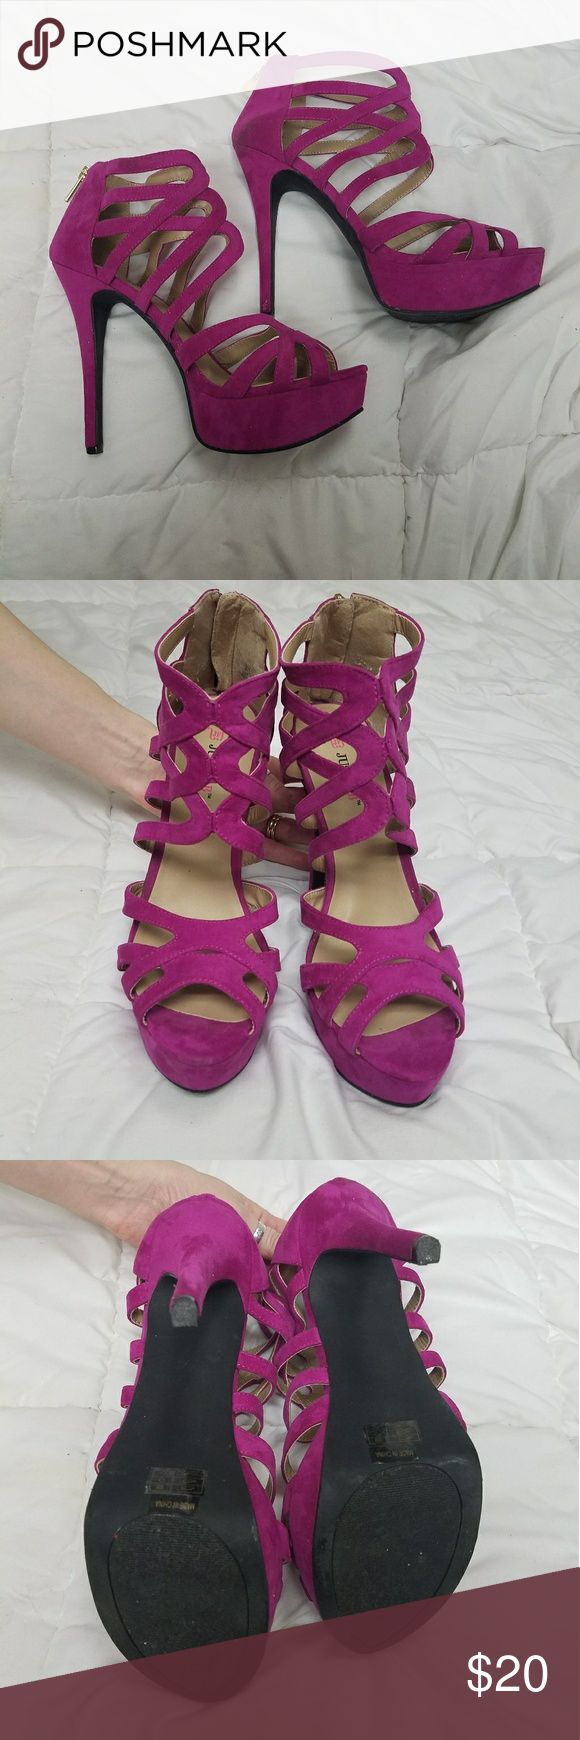 Justfab Lilias purple strappy heels Worn once JustFab Shoes Heels